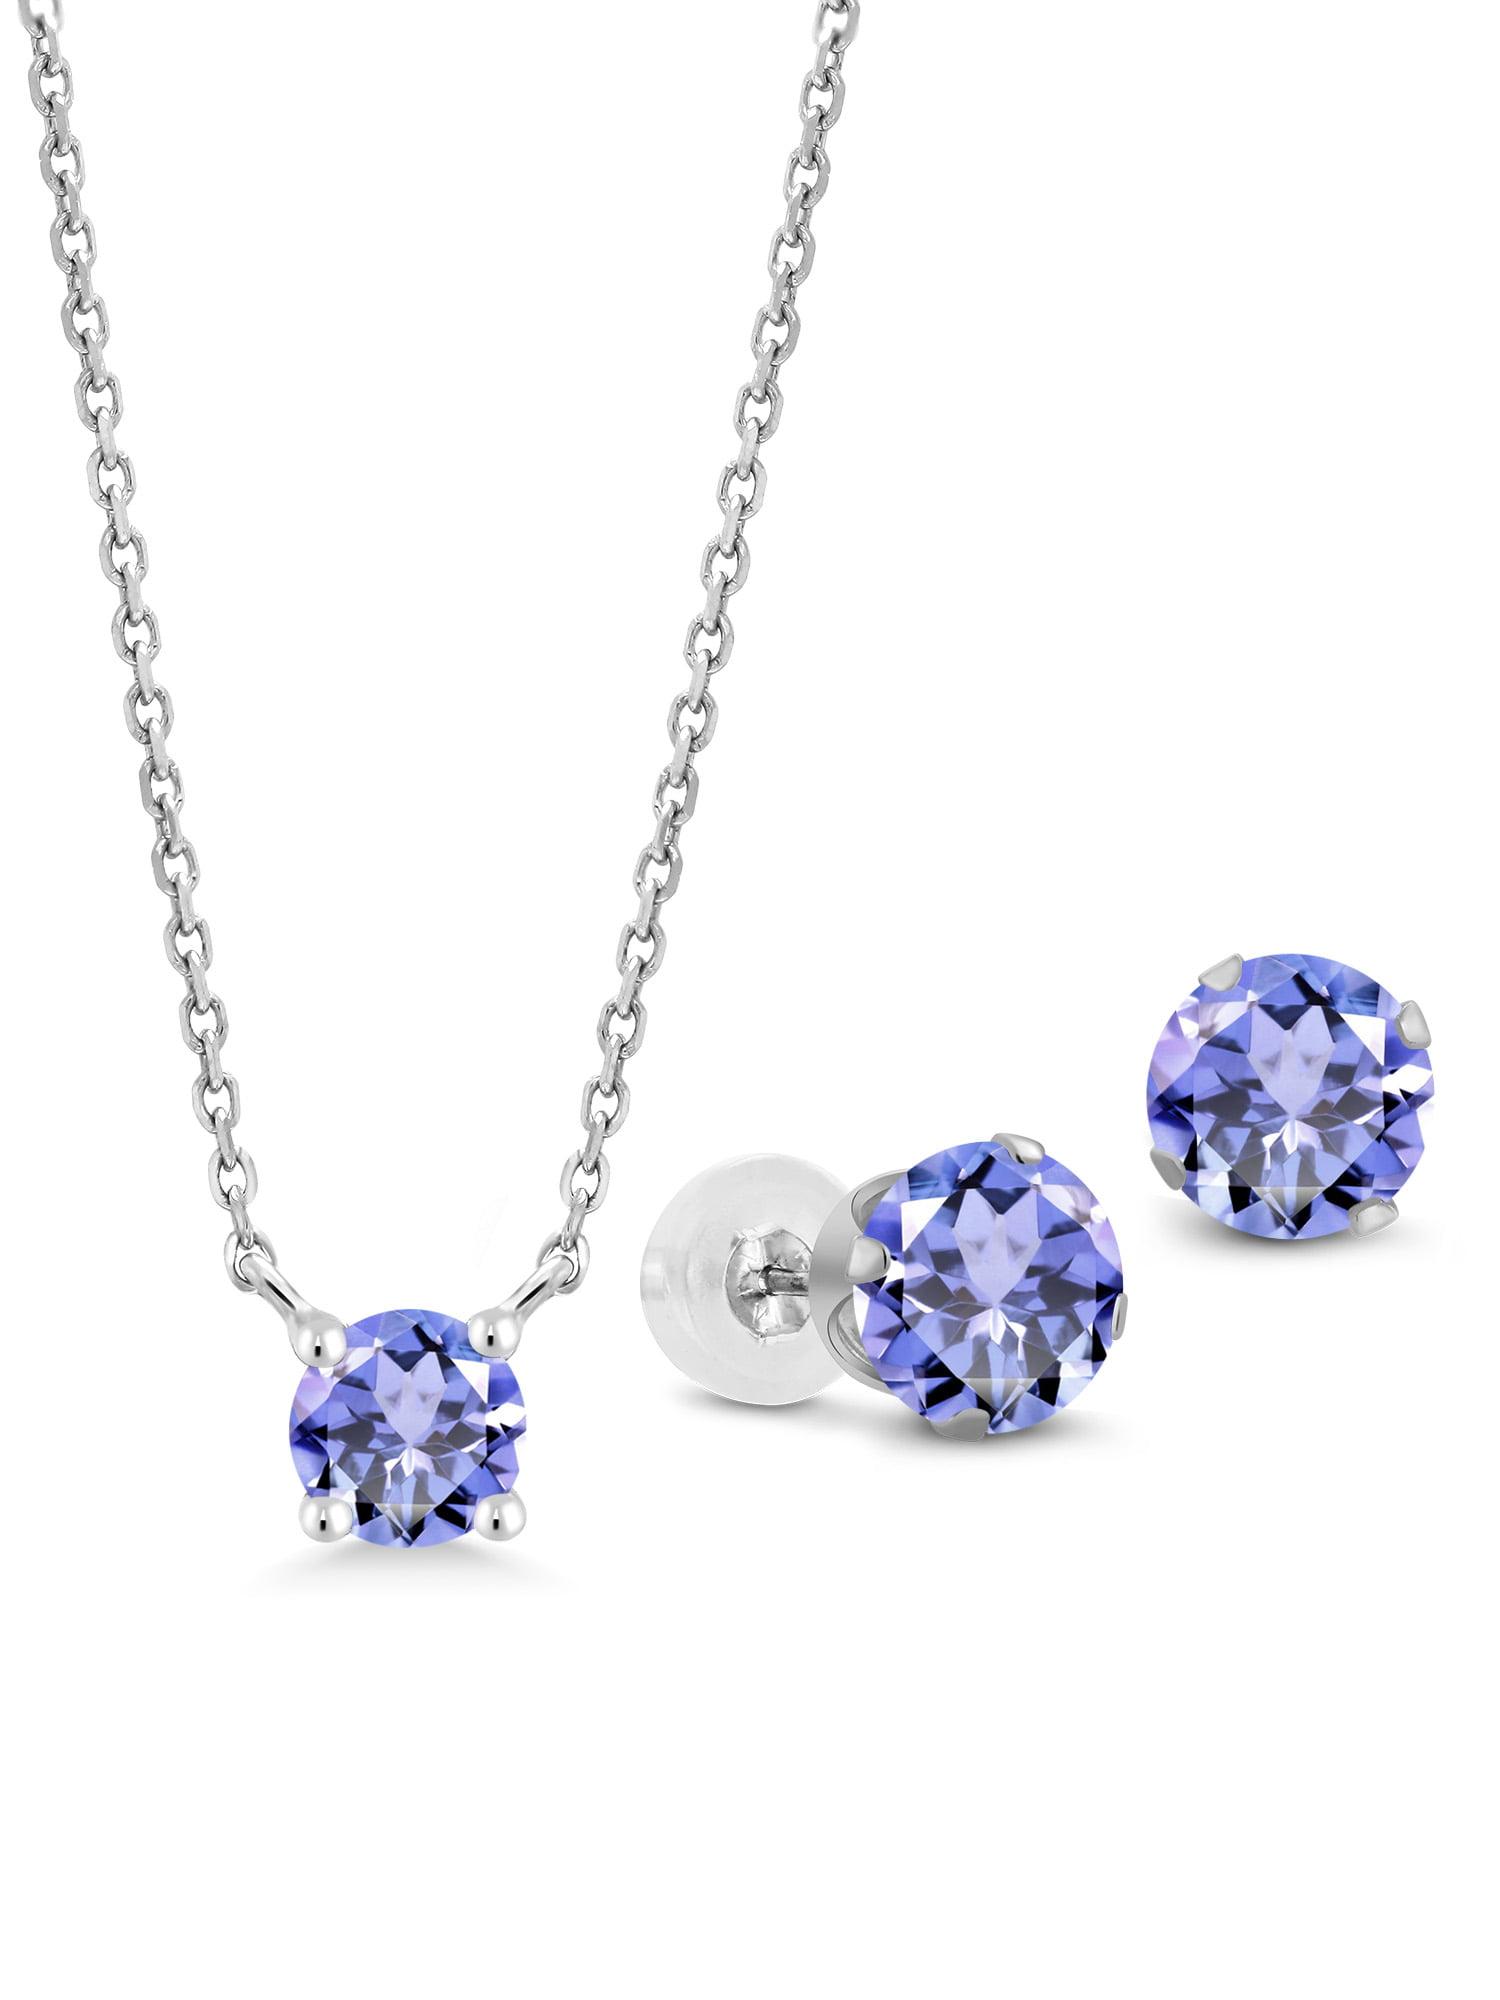 2.10 Ct Round Blue Tanzanite 10K White Gold Pendant Earrings Set by